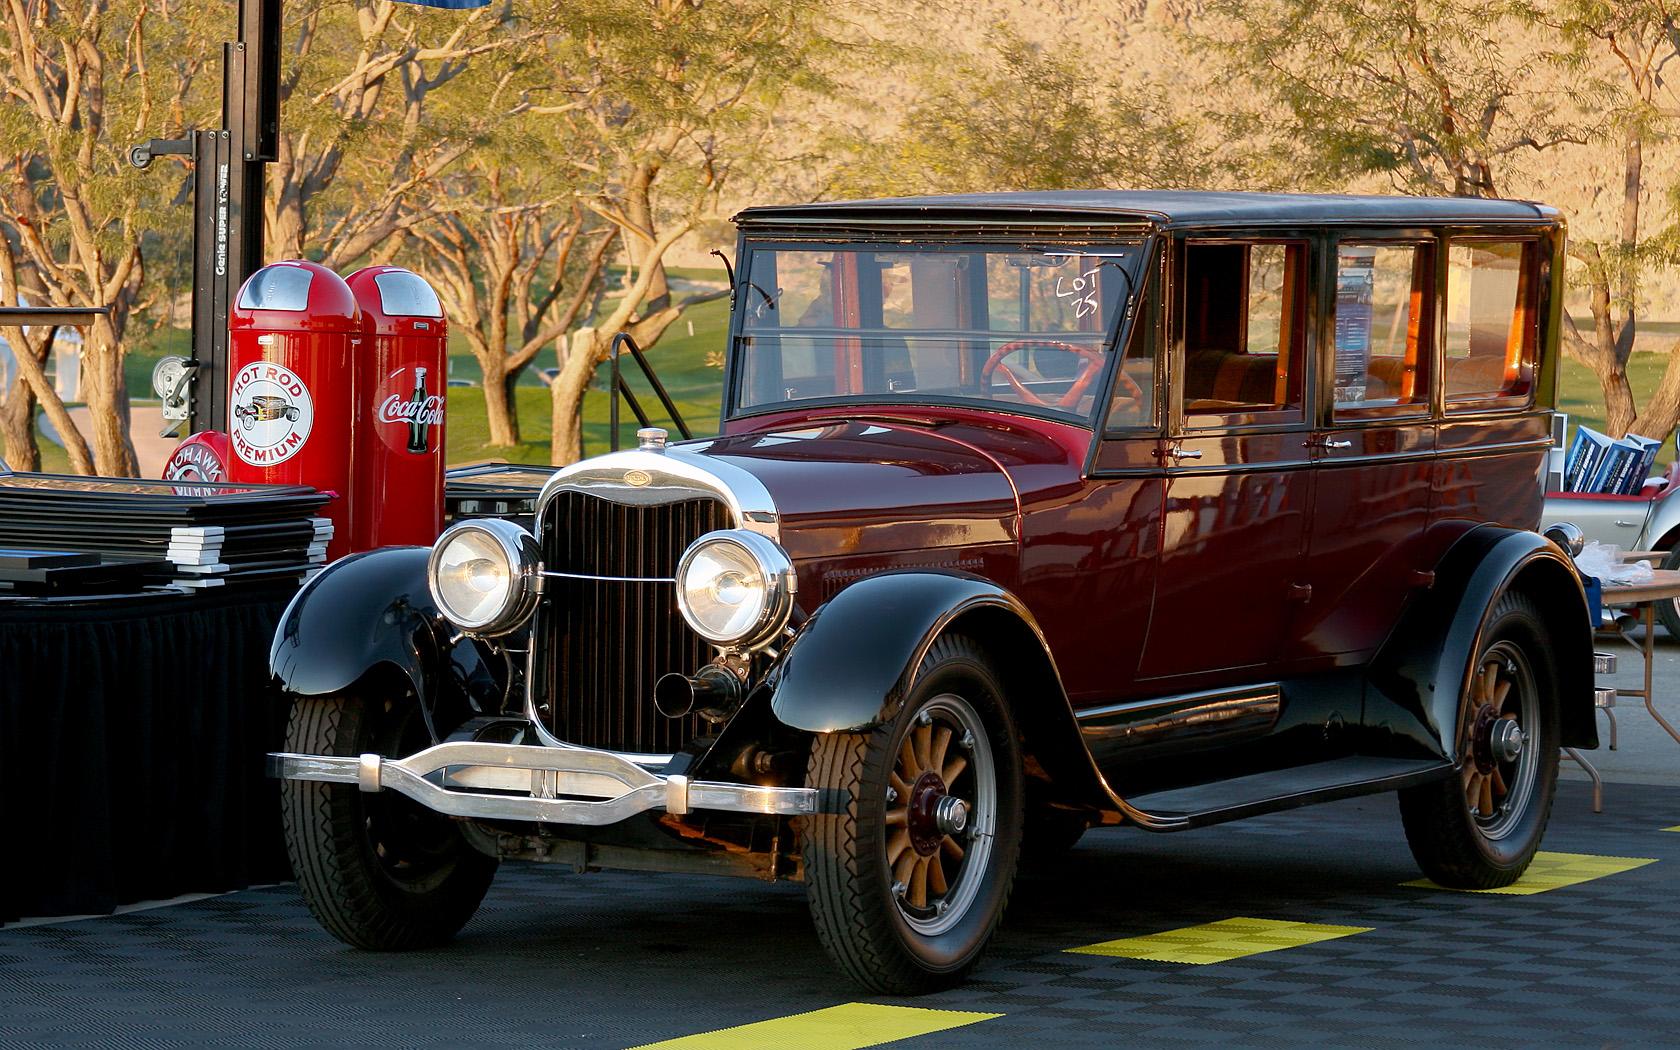 File:1925 Lincoln - Greta Garbo Car - fvl.jpg - Wikimedia Commons